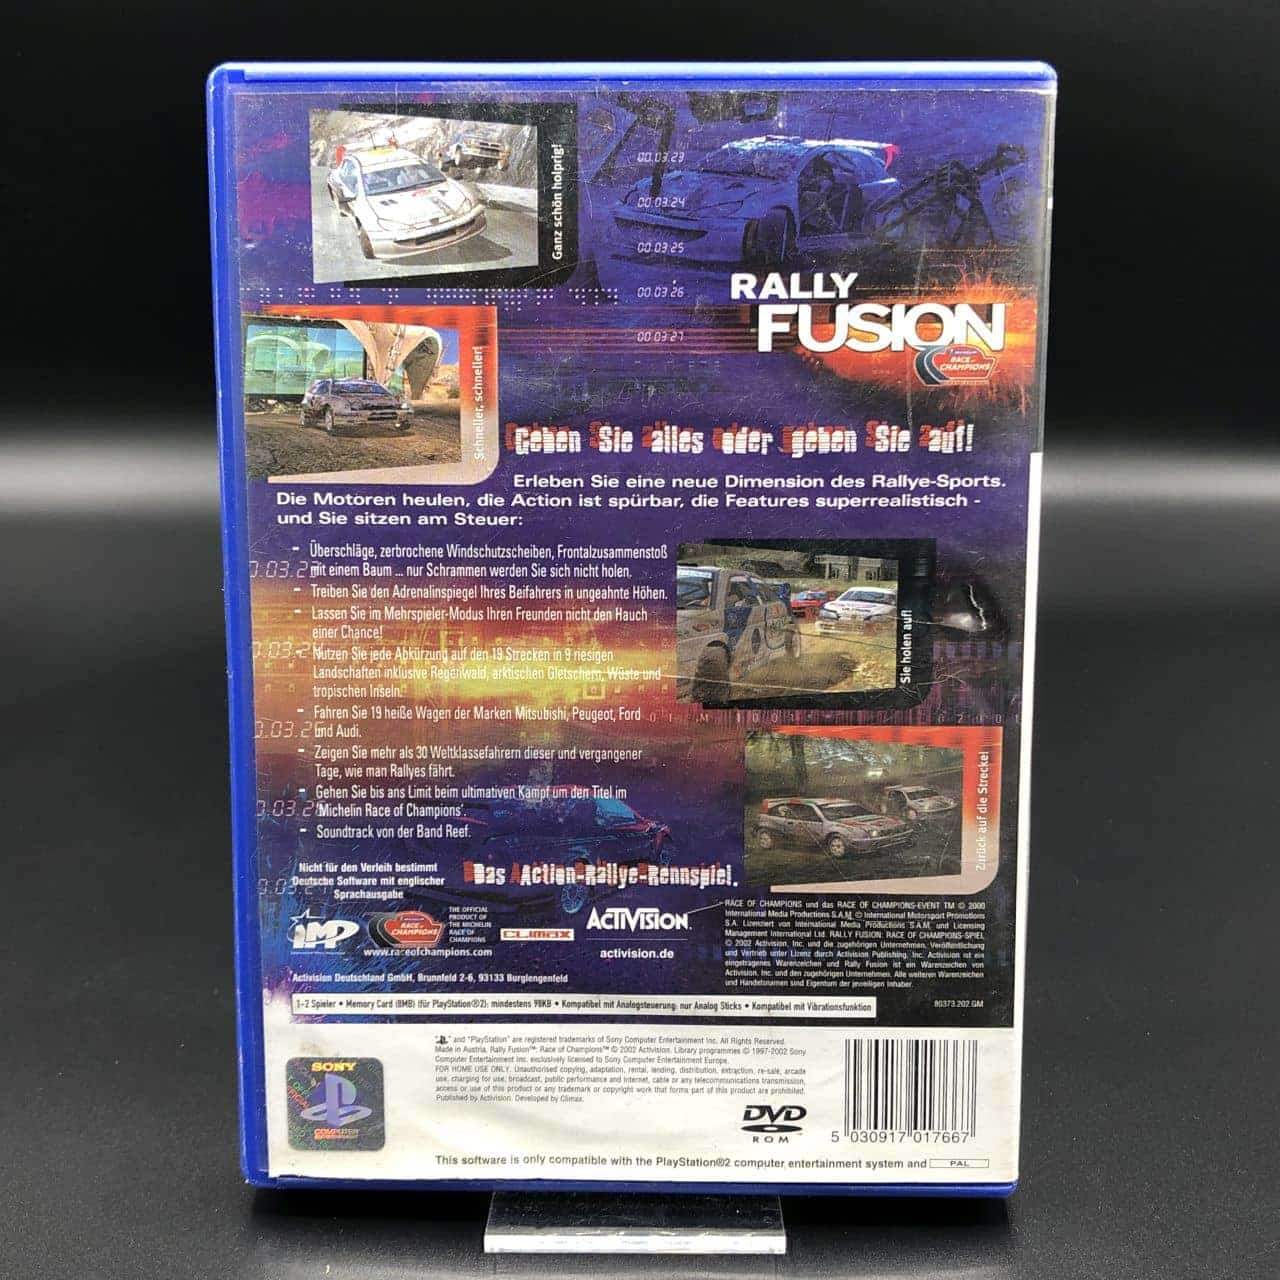 PS2 Rally Fusion: Race of Champions (Komplett) (Gebrauchsspuren) Sony PlayStation 2